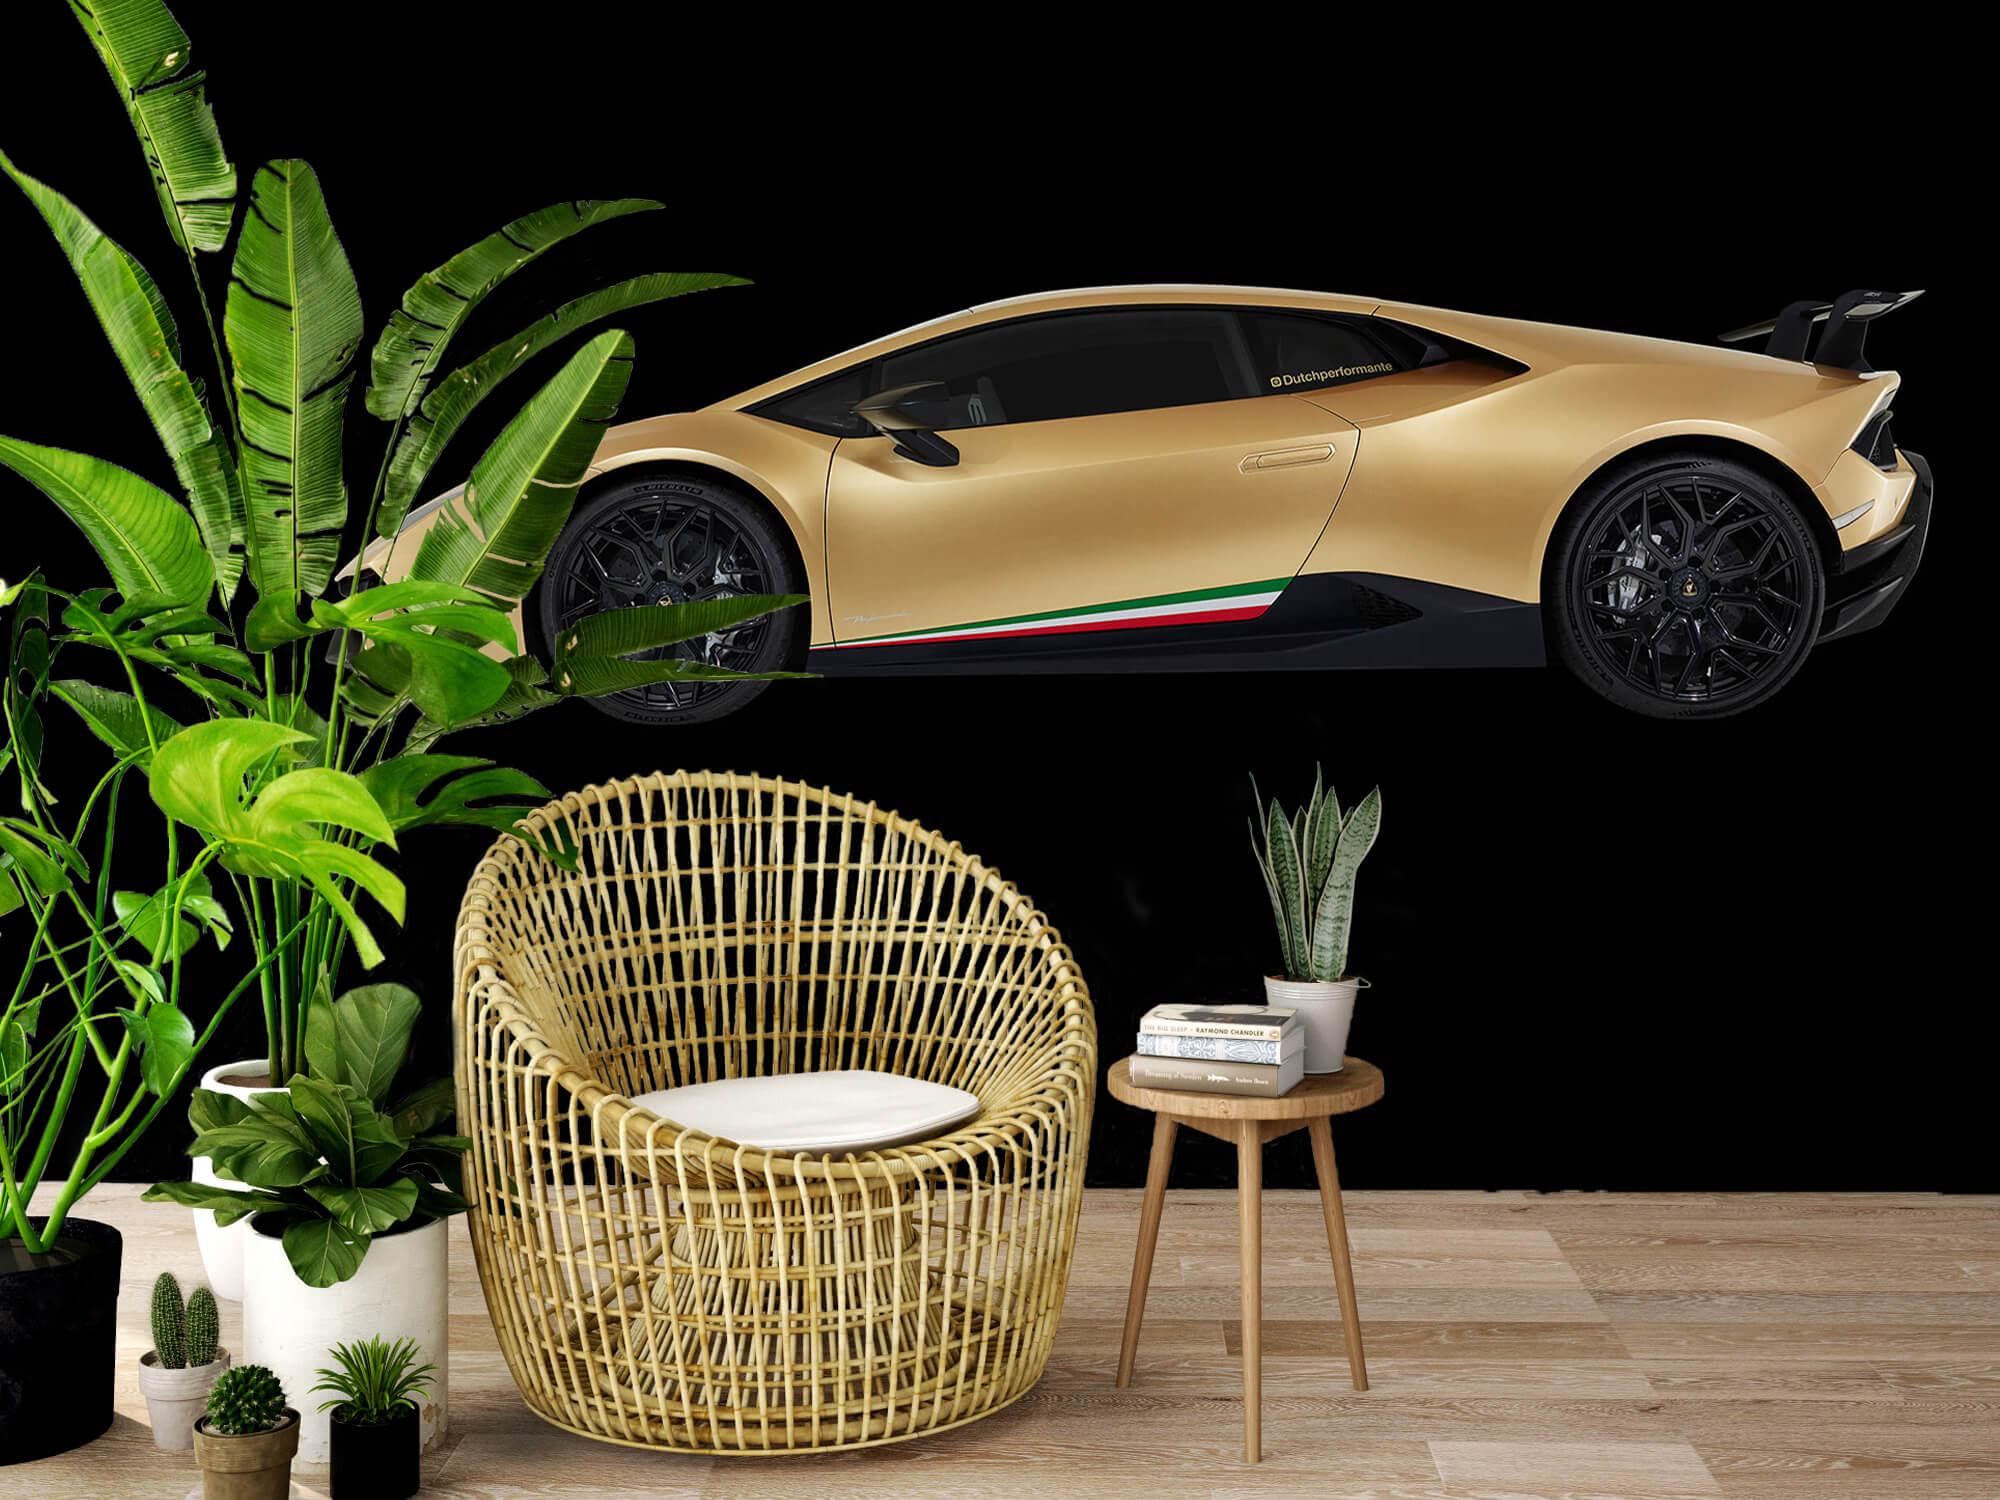 Wallpaper Lamborghini Huracán - Côté, noir 7